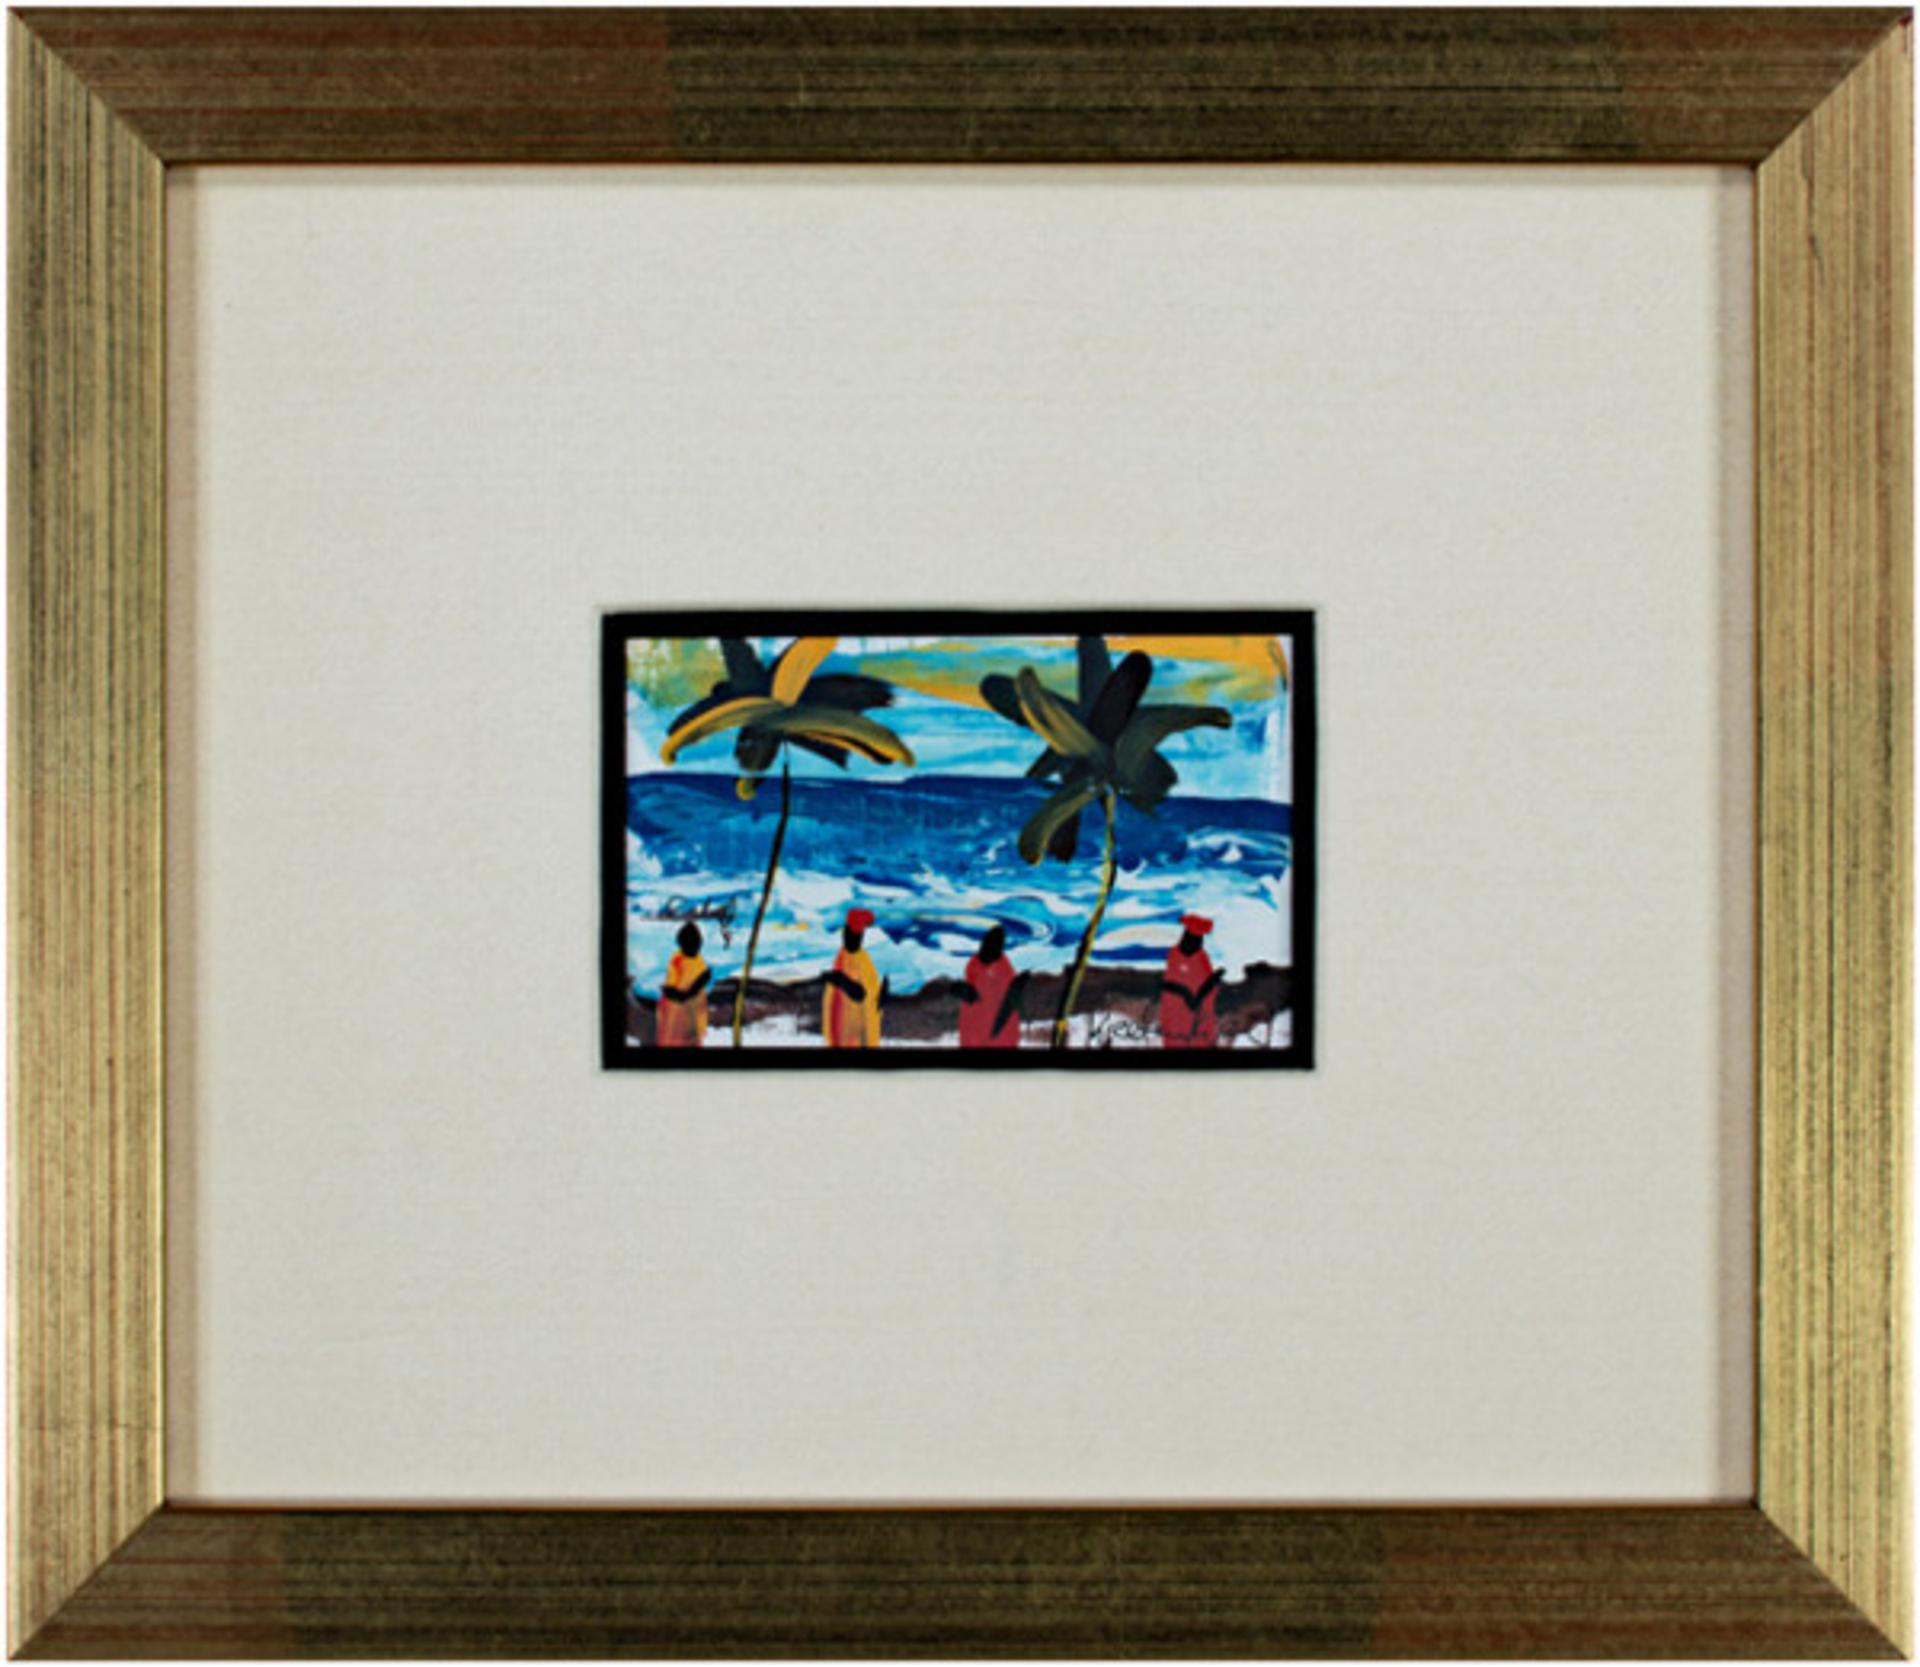 Dancing on the Sandy Beach of the S. Atlantic Shore, Ghana, Africa (Palm Trees) by Samuel B. Kpetenkple